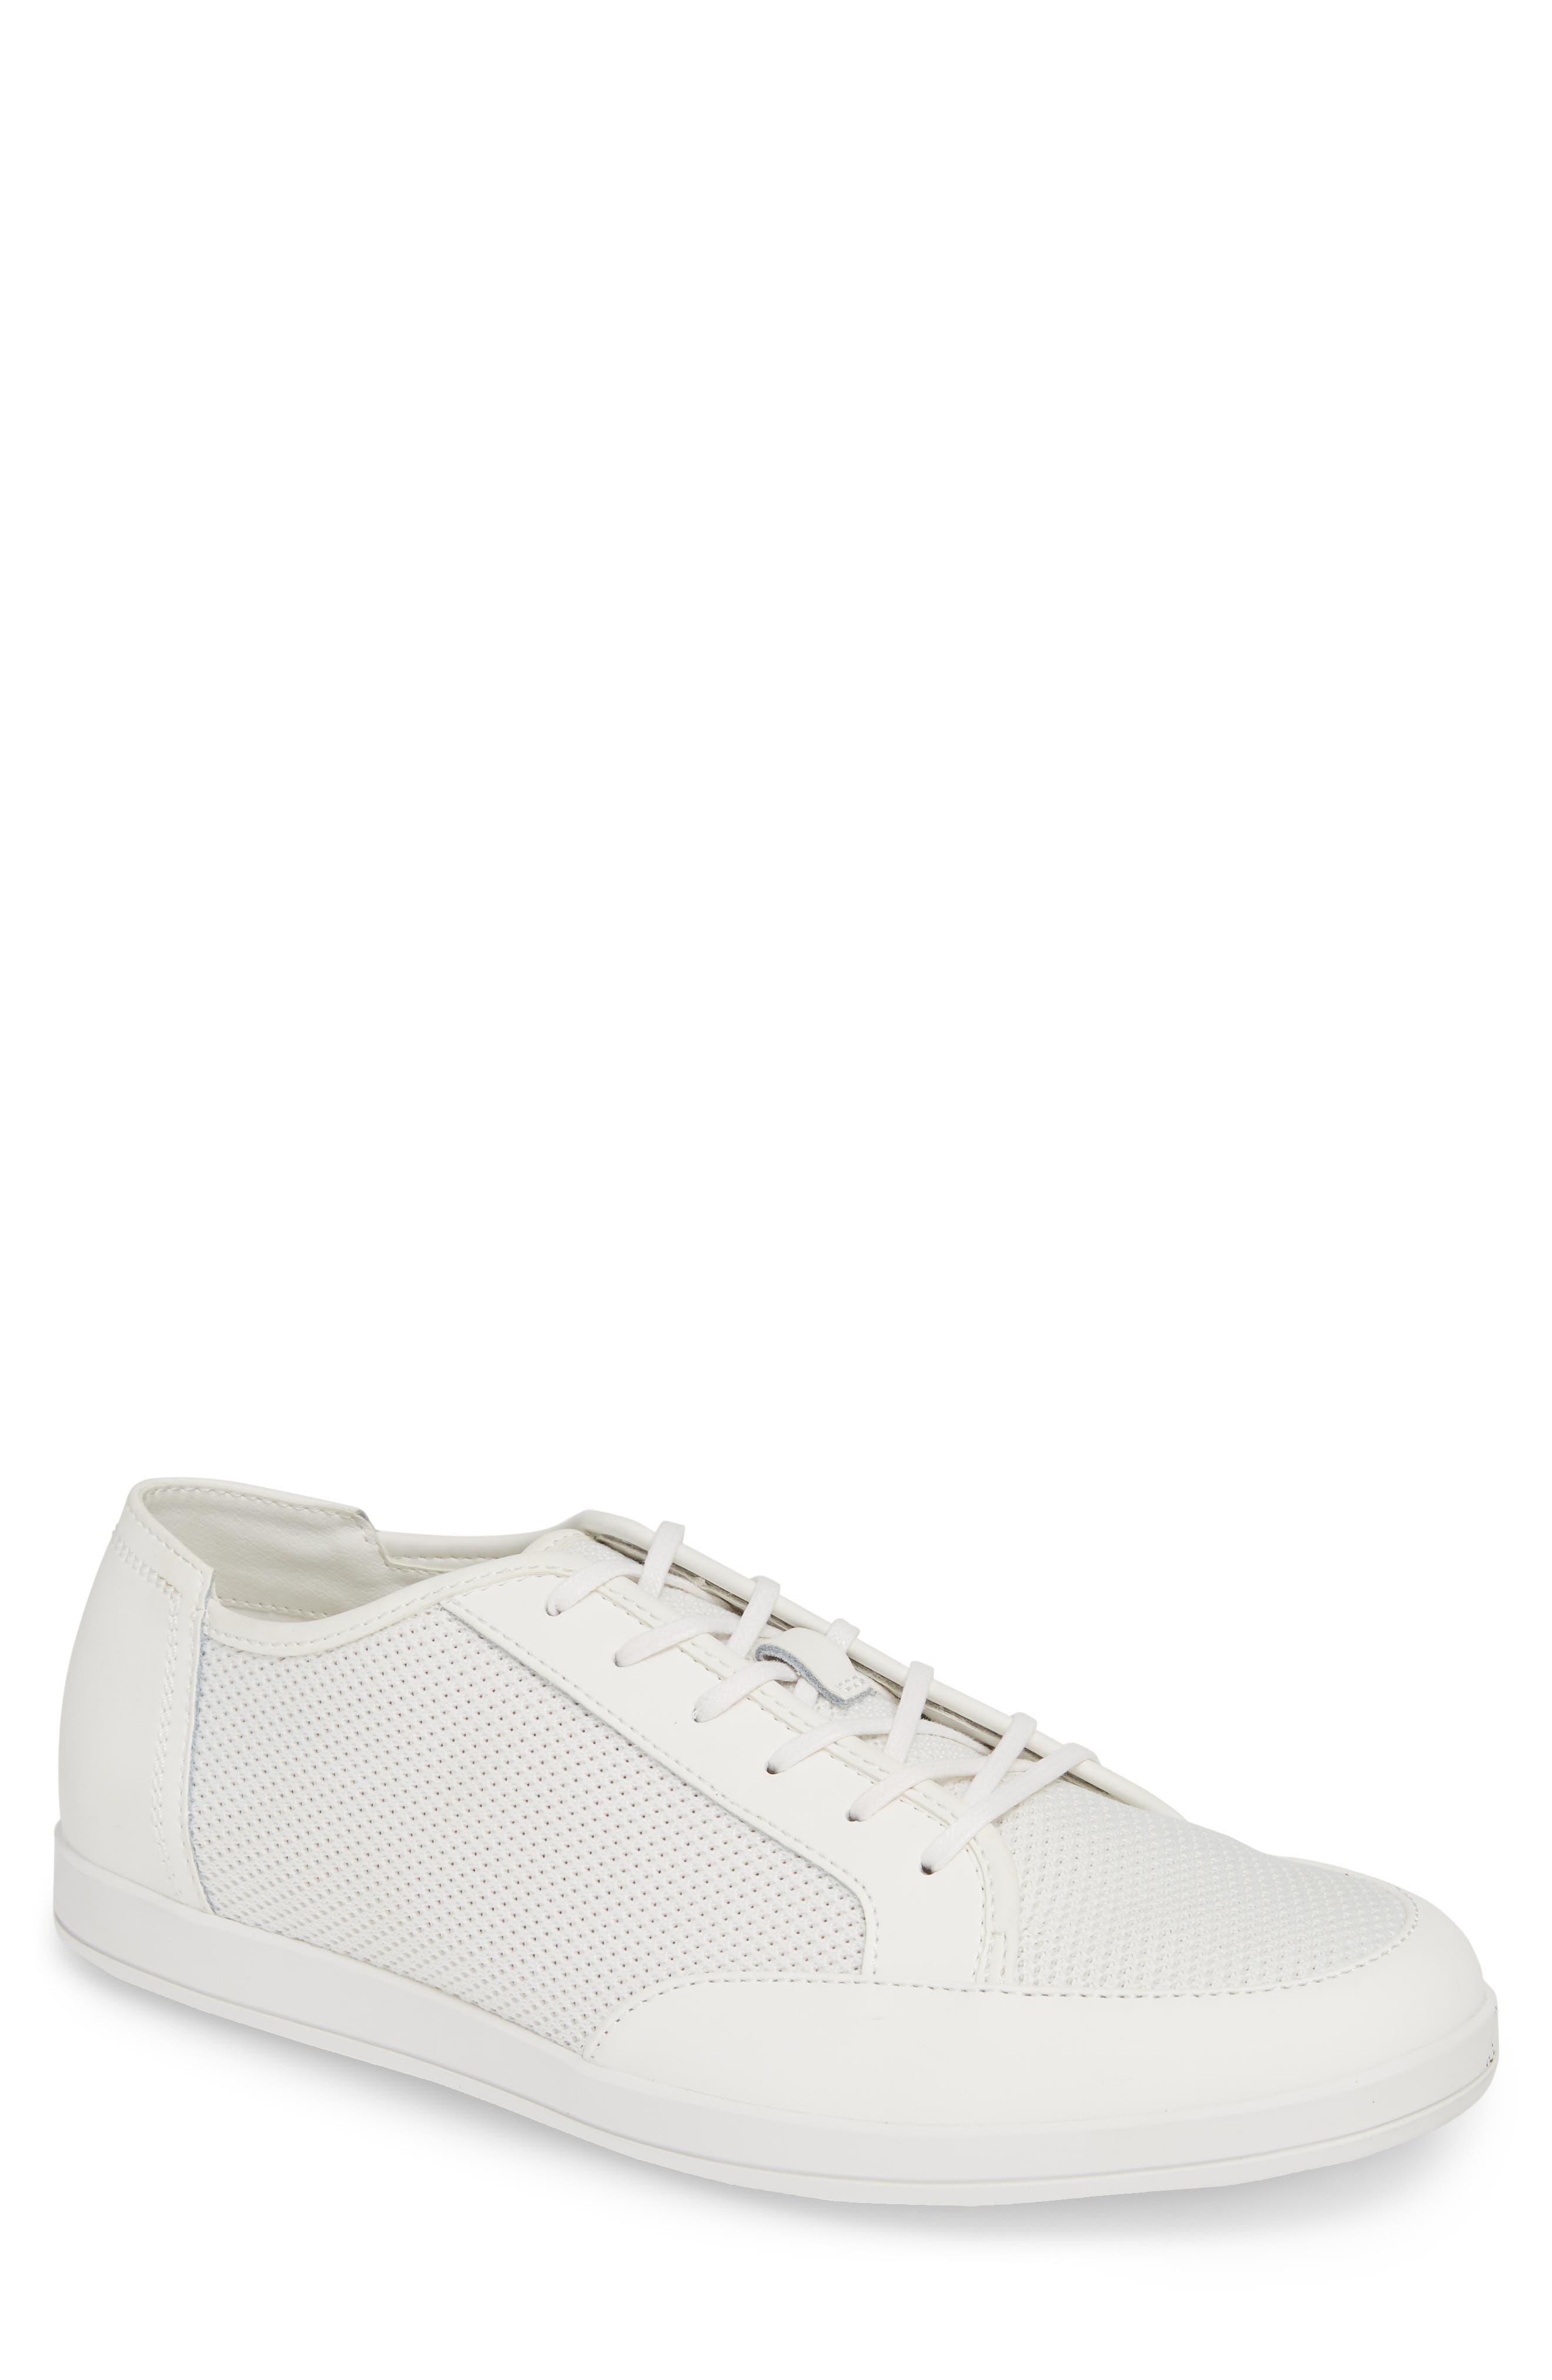 Calvin Klein Michael Sneaker- White